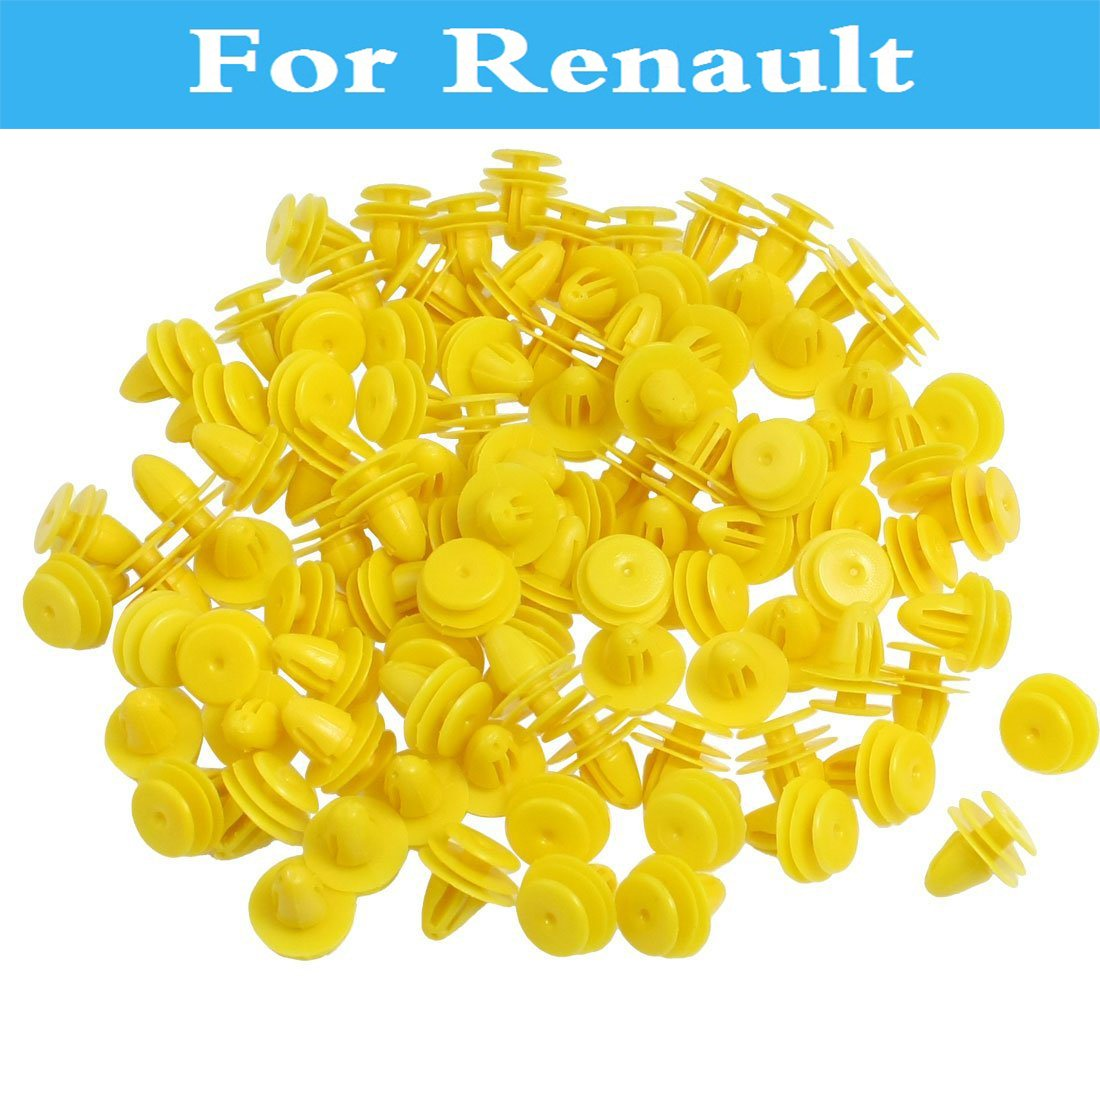 100pcs Rivets Car Bumper Fender Trim Panel Clips Yellow For Renault Twizy Vel Satis Symbol Talisman Twingo Wind Zoe Sandero Rs